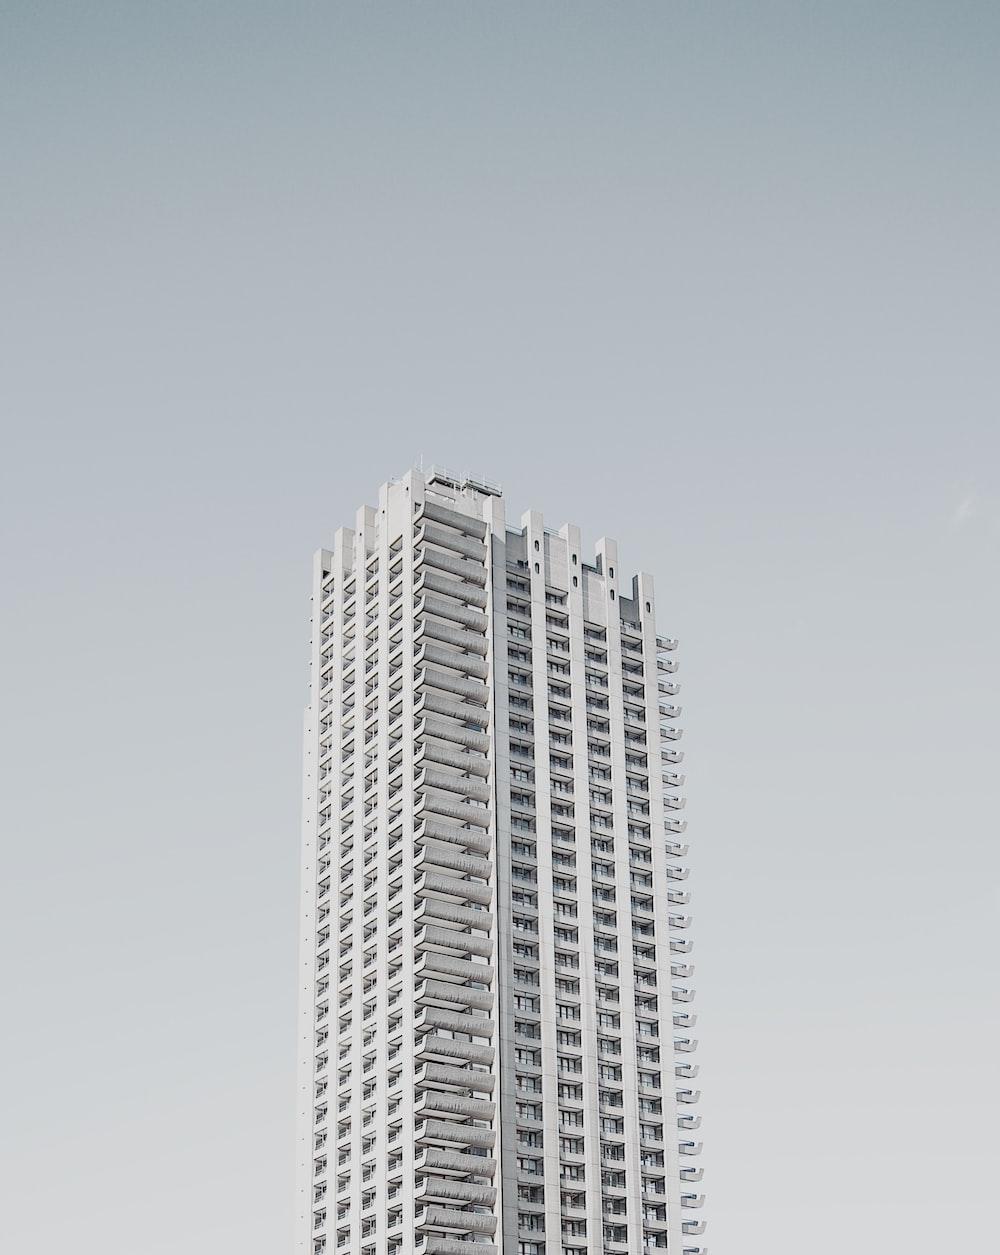 white concrete high-rise building